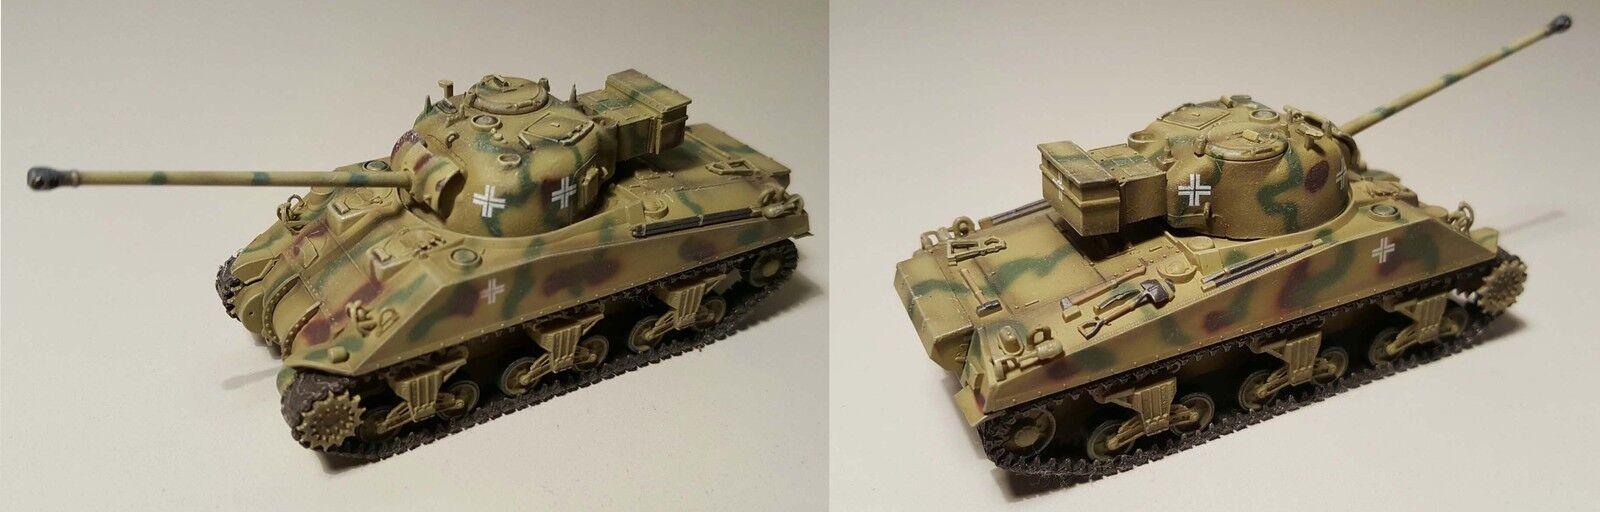 DRAGON ARMOR 1 72 Firefly Vc, German Army, Western Front 1945 60260